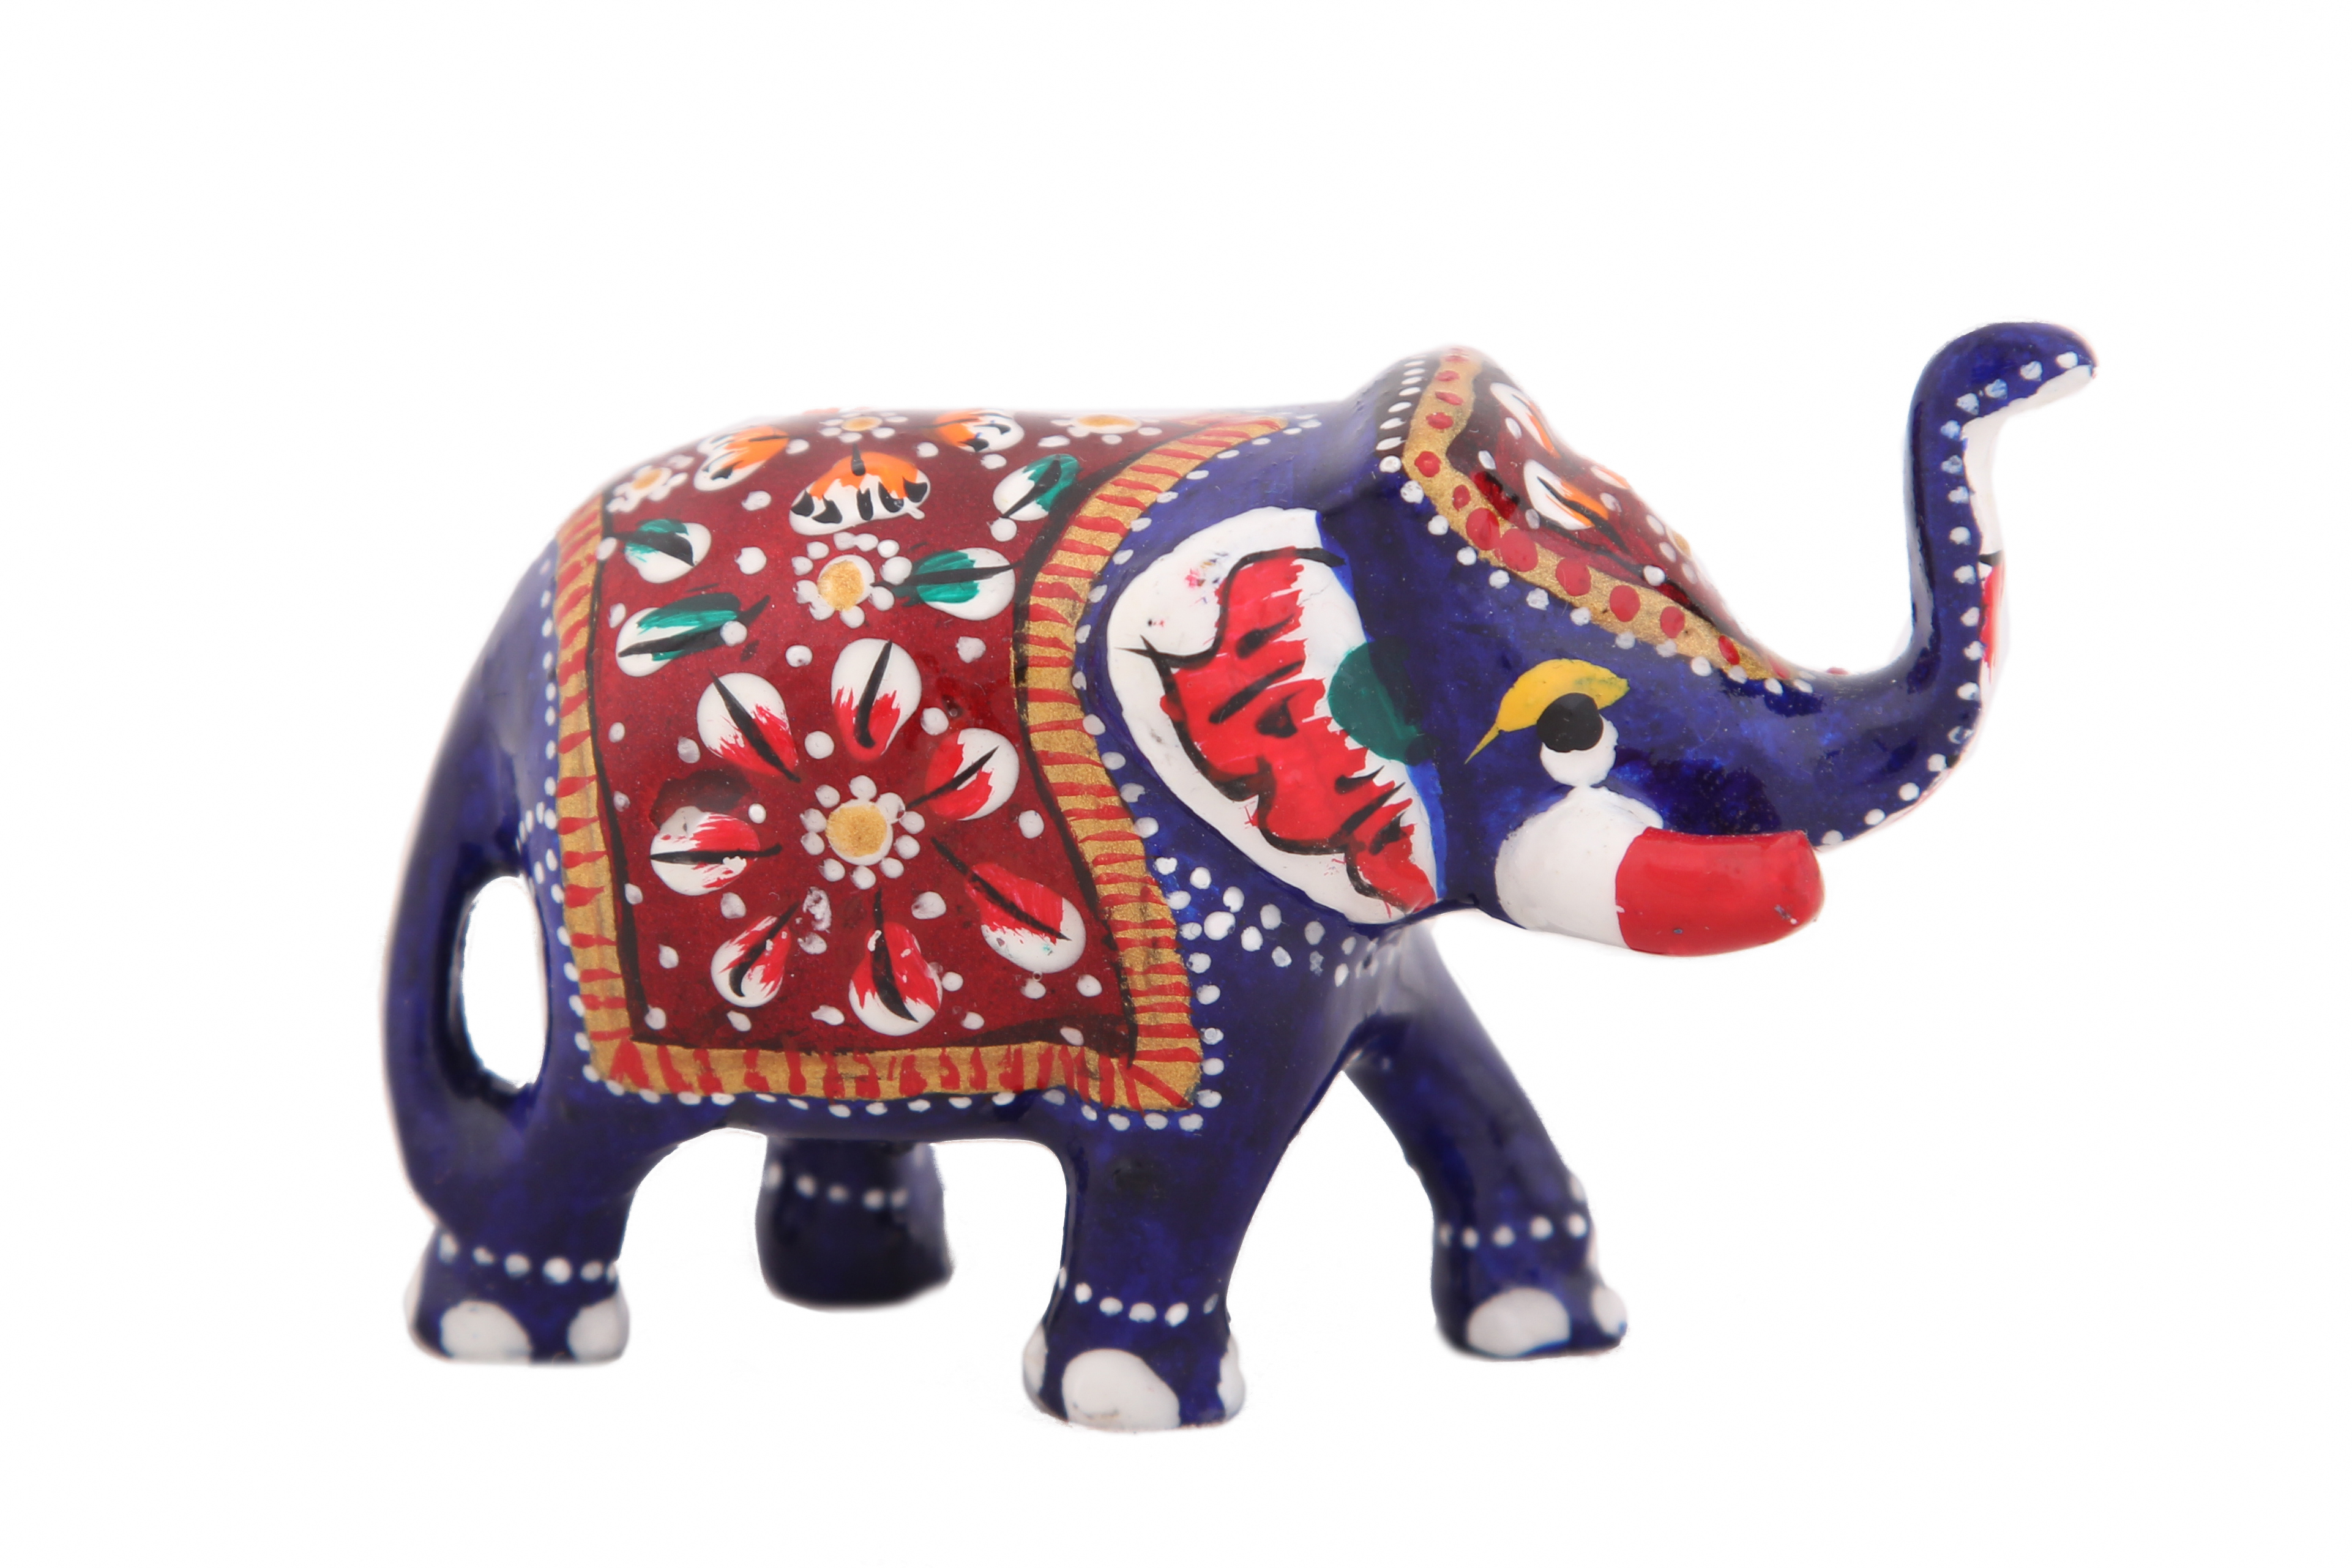 {} Ганг Статуэтка Слон (3х5х7 см) статуэтка африканка федерация статуэтка африканка